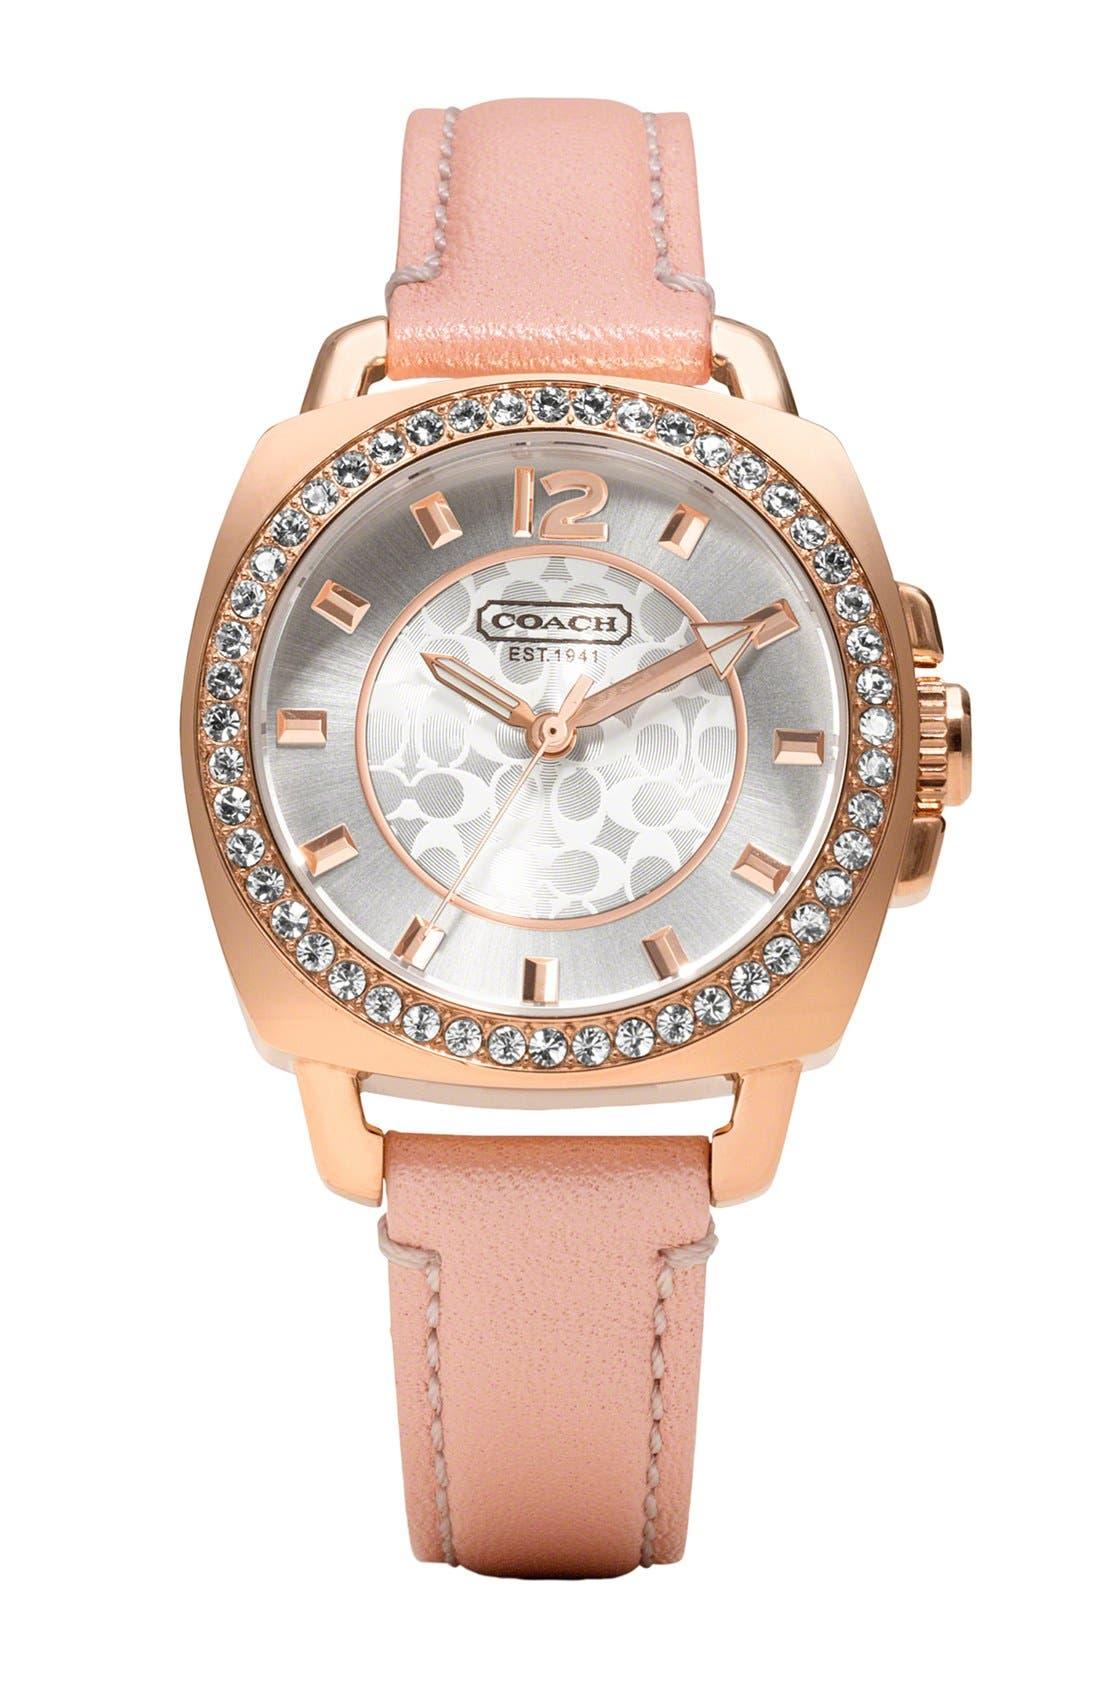 Main Image - COACH 'Boyfriend' Crystal Bezel Leather Strap Watch, 35mm